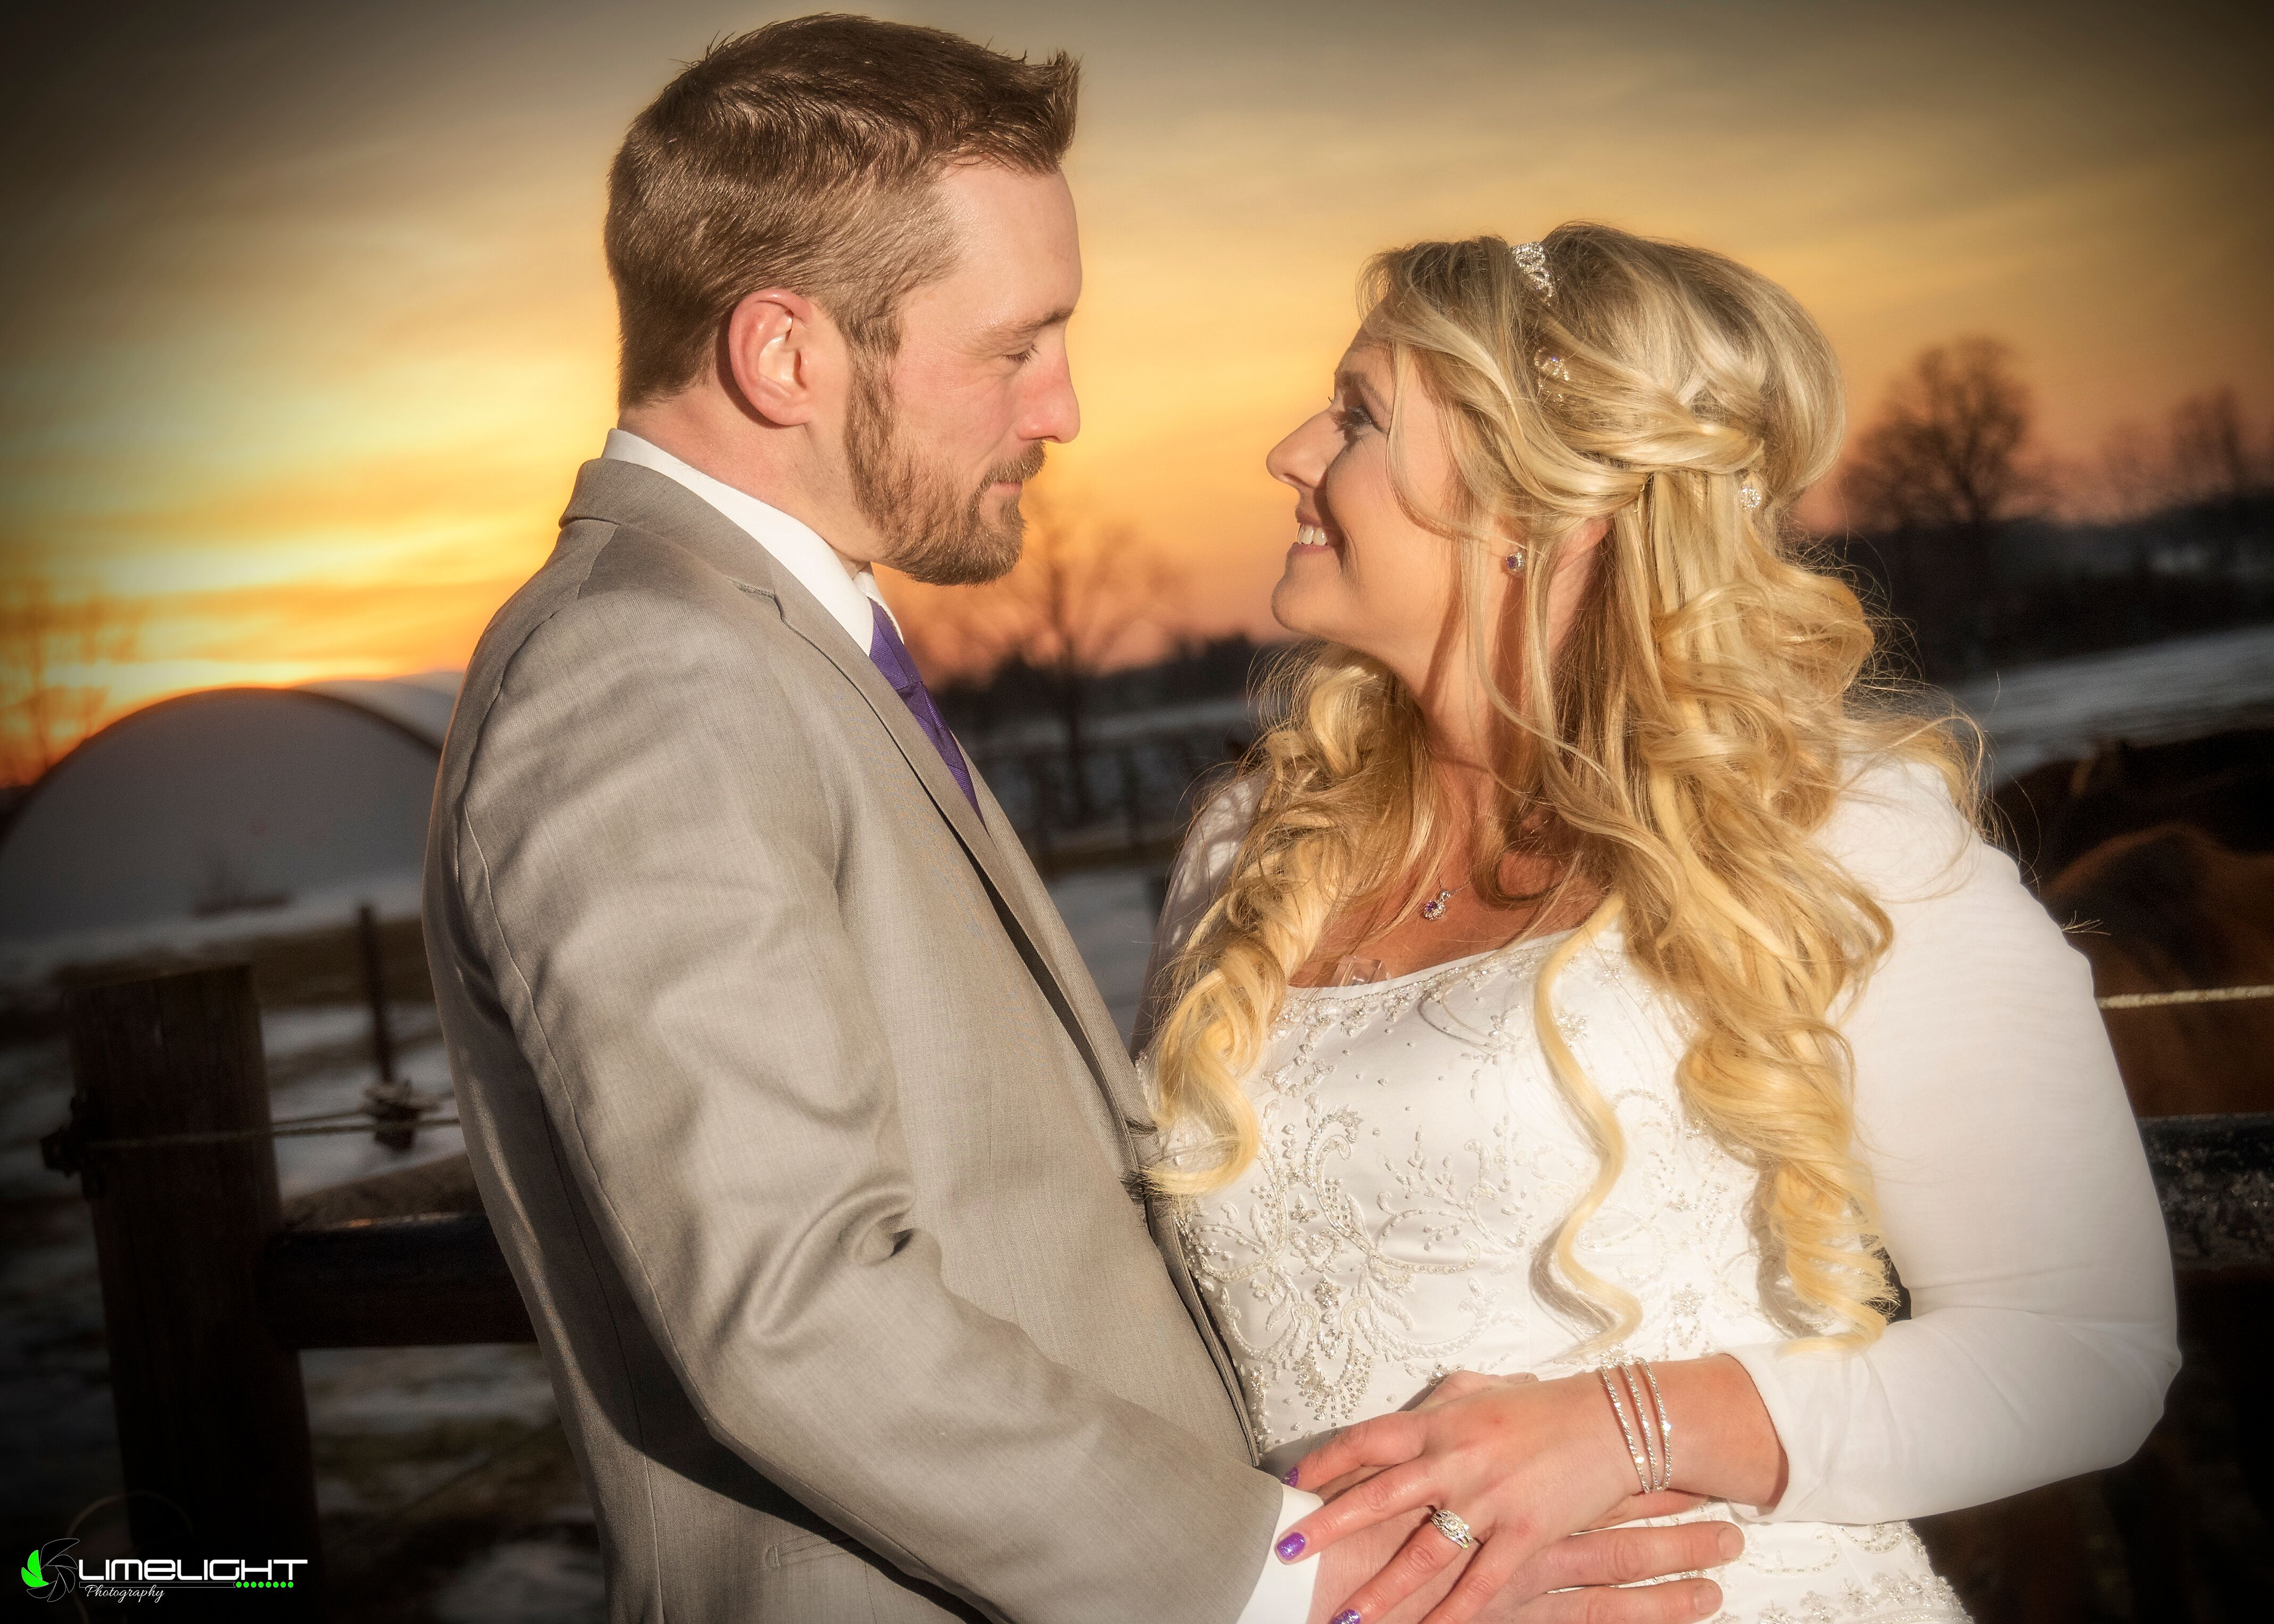 Wedding Photographers in Lansing, MI - The Knot